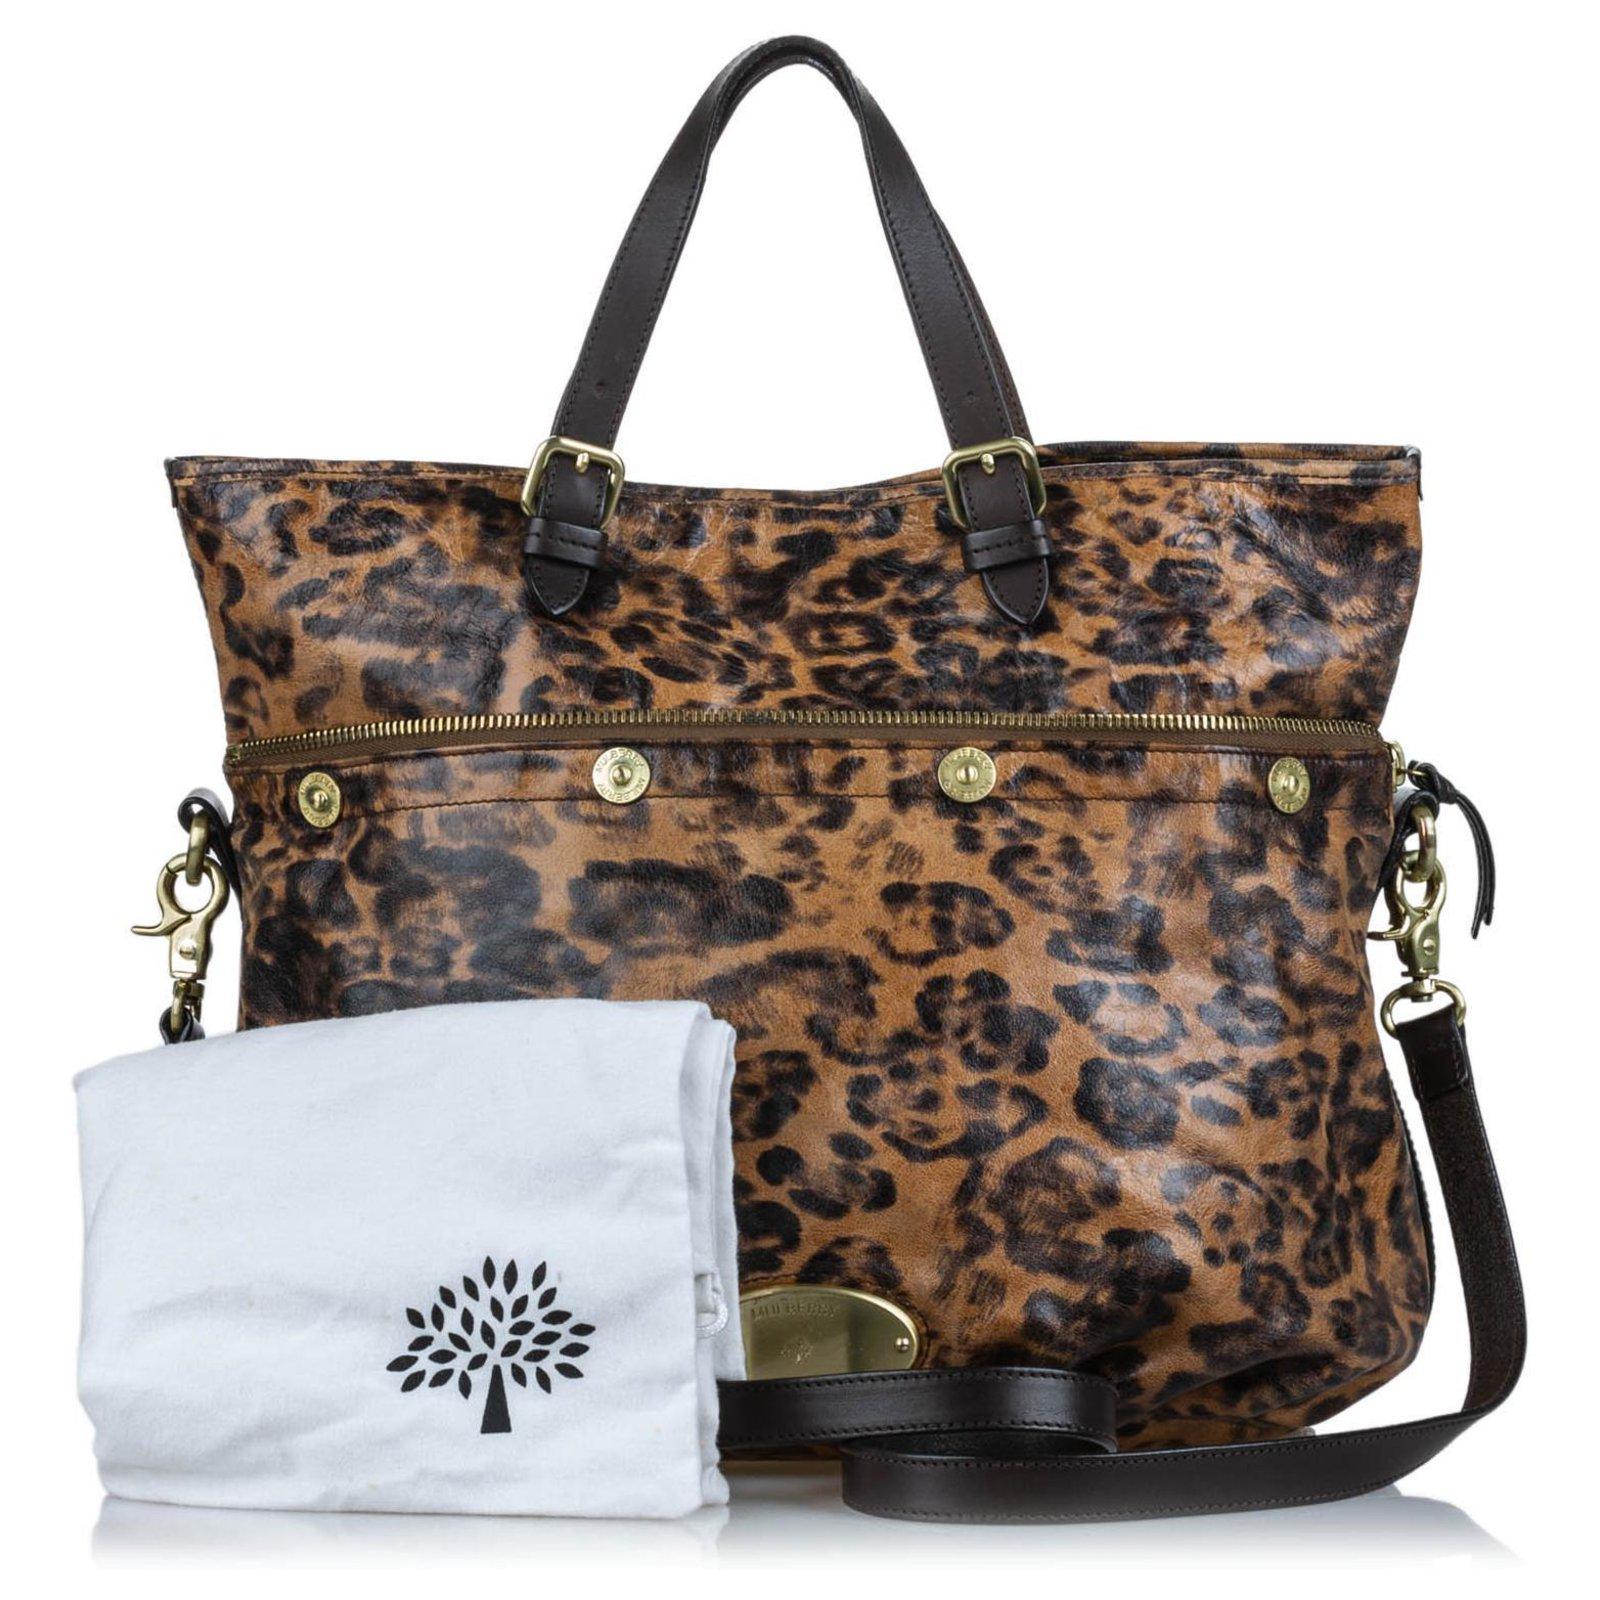 63f6aa8ba2b3 Mulberry Mulberry Brown Leopard Print Mitzy Satchel Handbags Leather,Other  Brown,Black ref.134115 - Joli Closet